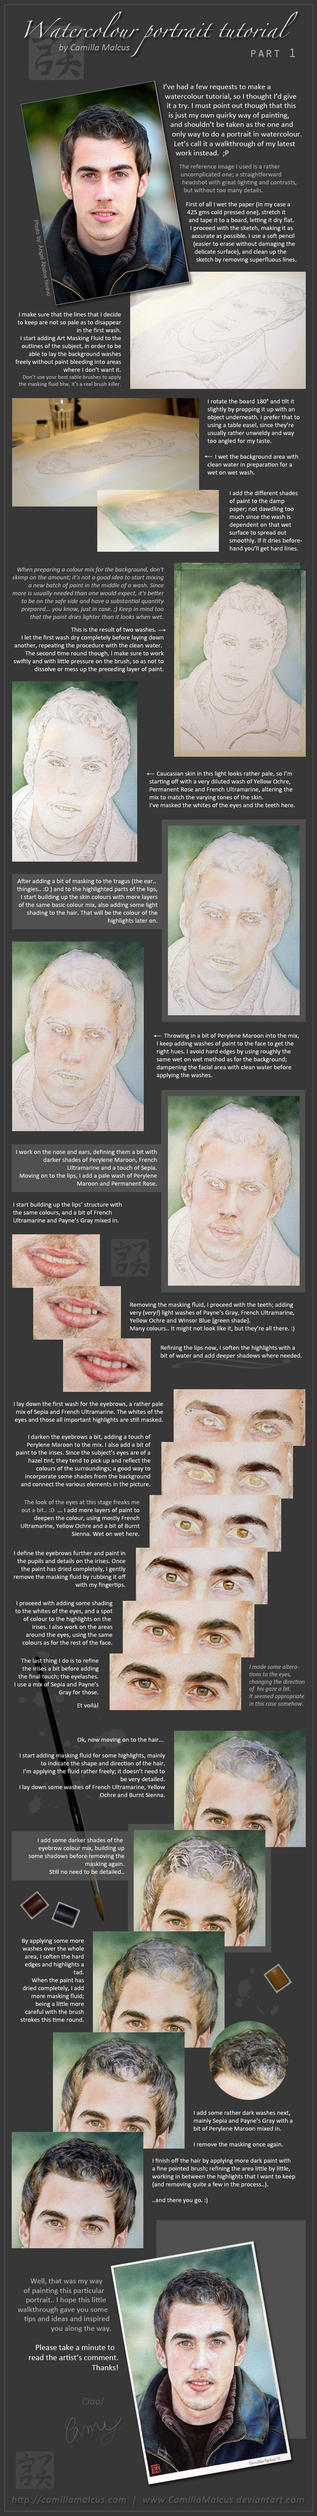 Watercolour Portrait Tutorial by CamillaMalcus